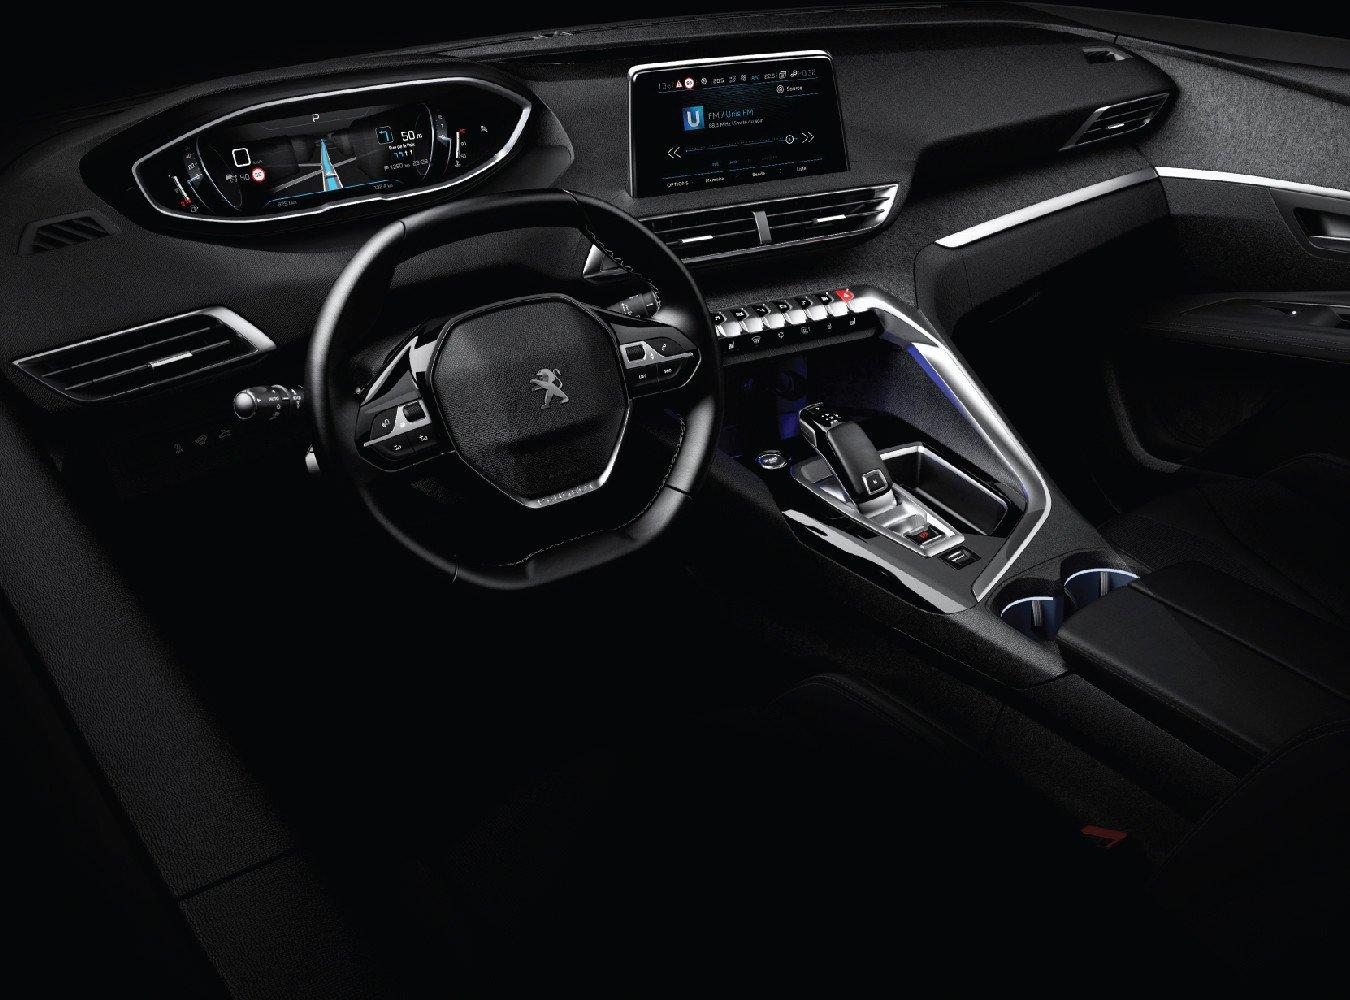 Nội thất trên xe Peugeot 3008